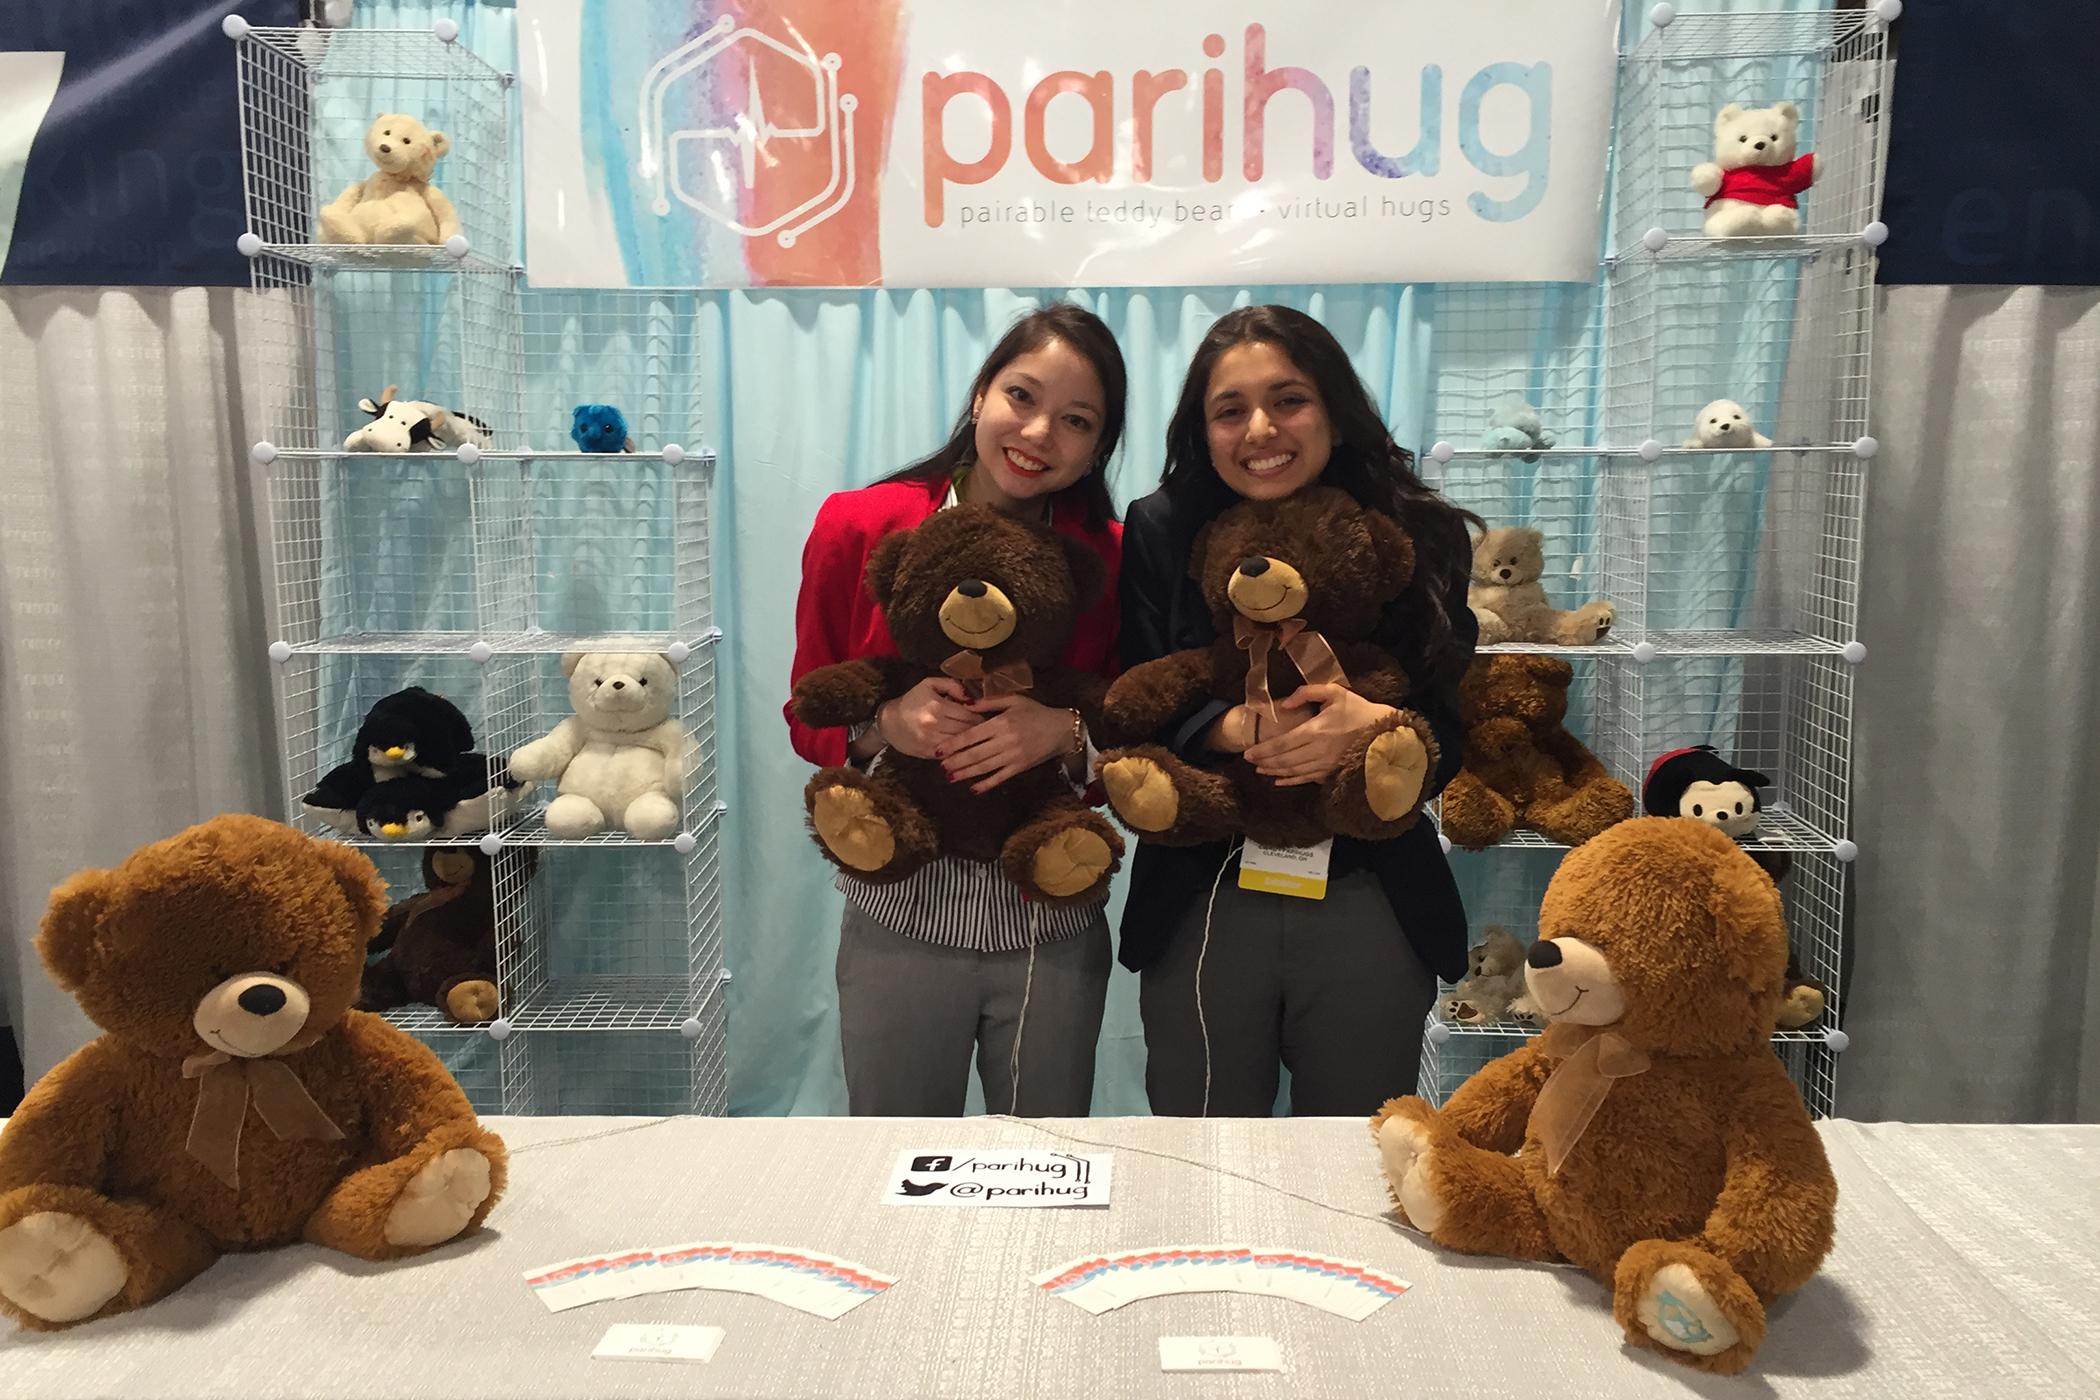 Parihug co-founders Xyla Foxlin and Harshita Gupta